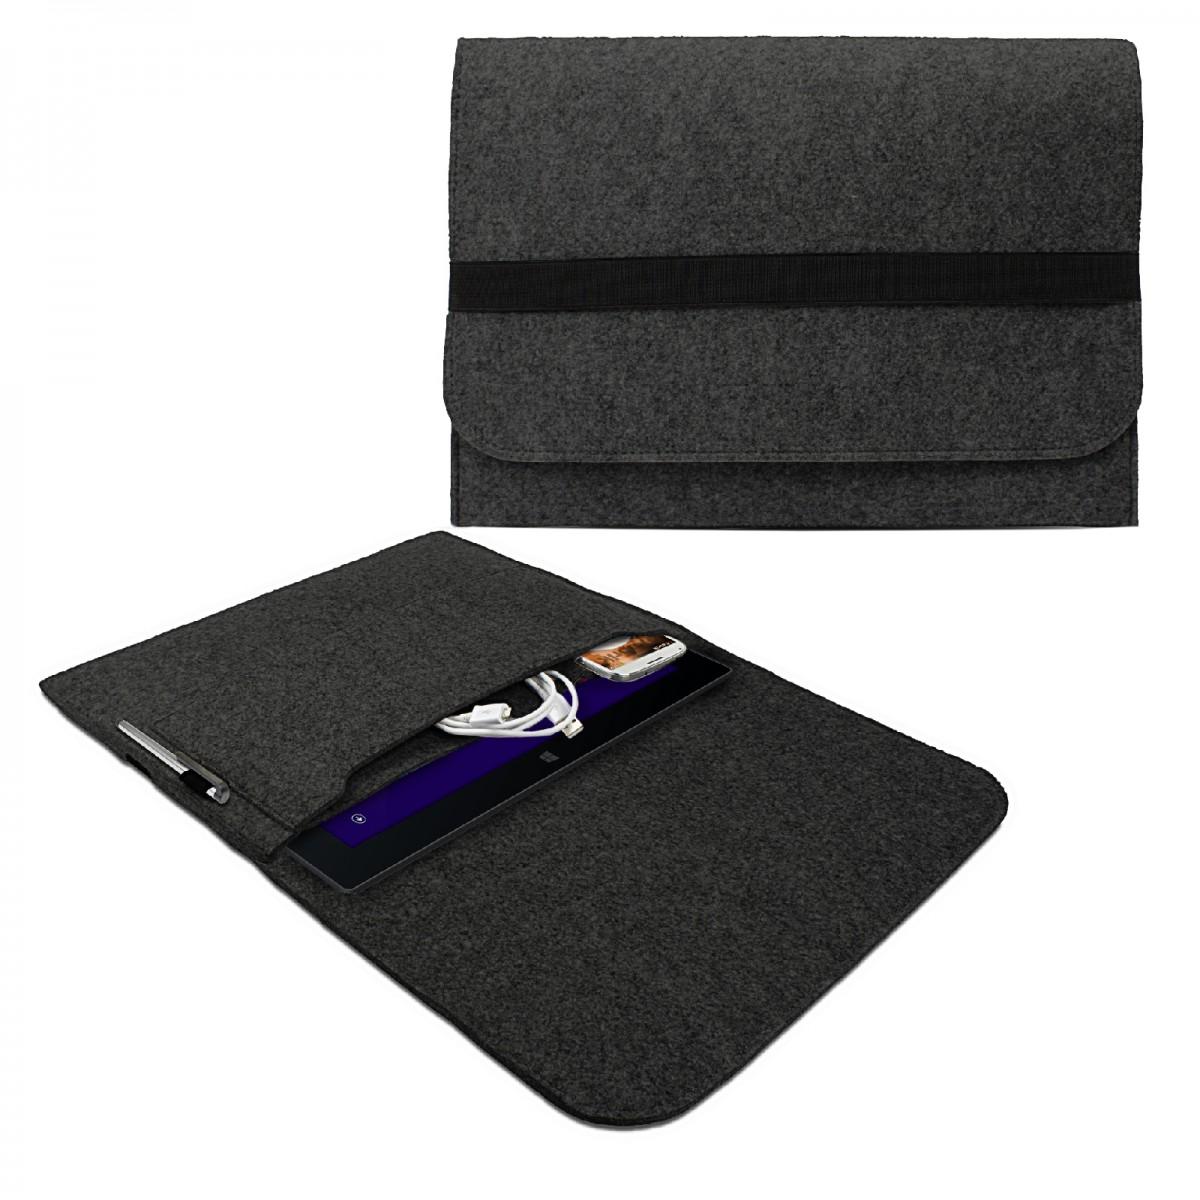 efabrik schutz h lle f r tablet 10 2 12 2 zoll tasche cover case zubeh r filz dunkel grau. Black Bedroom Furniture Sets. Home Design Ideas